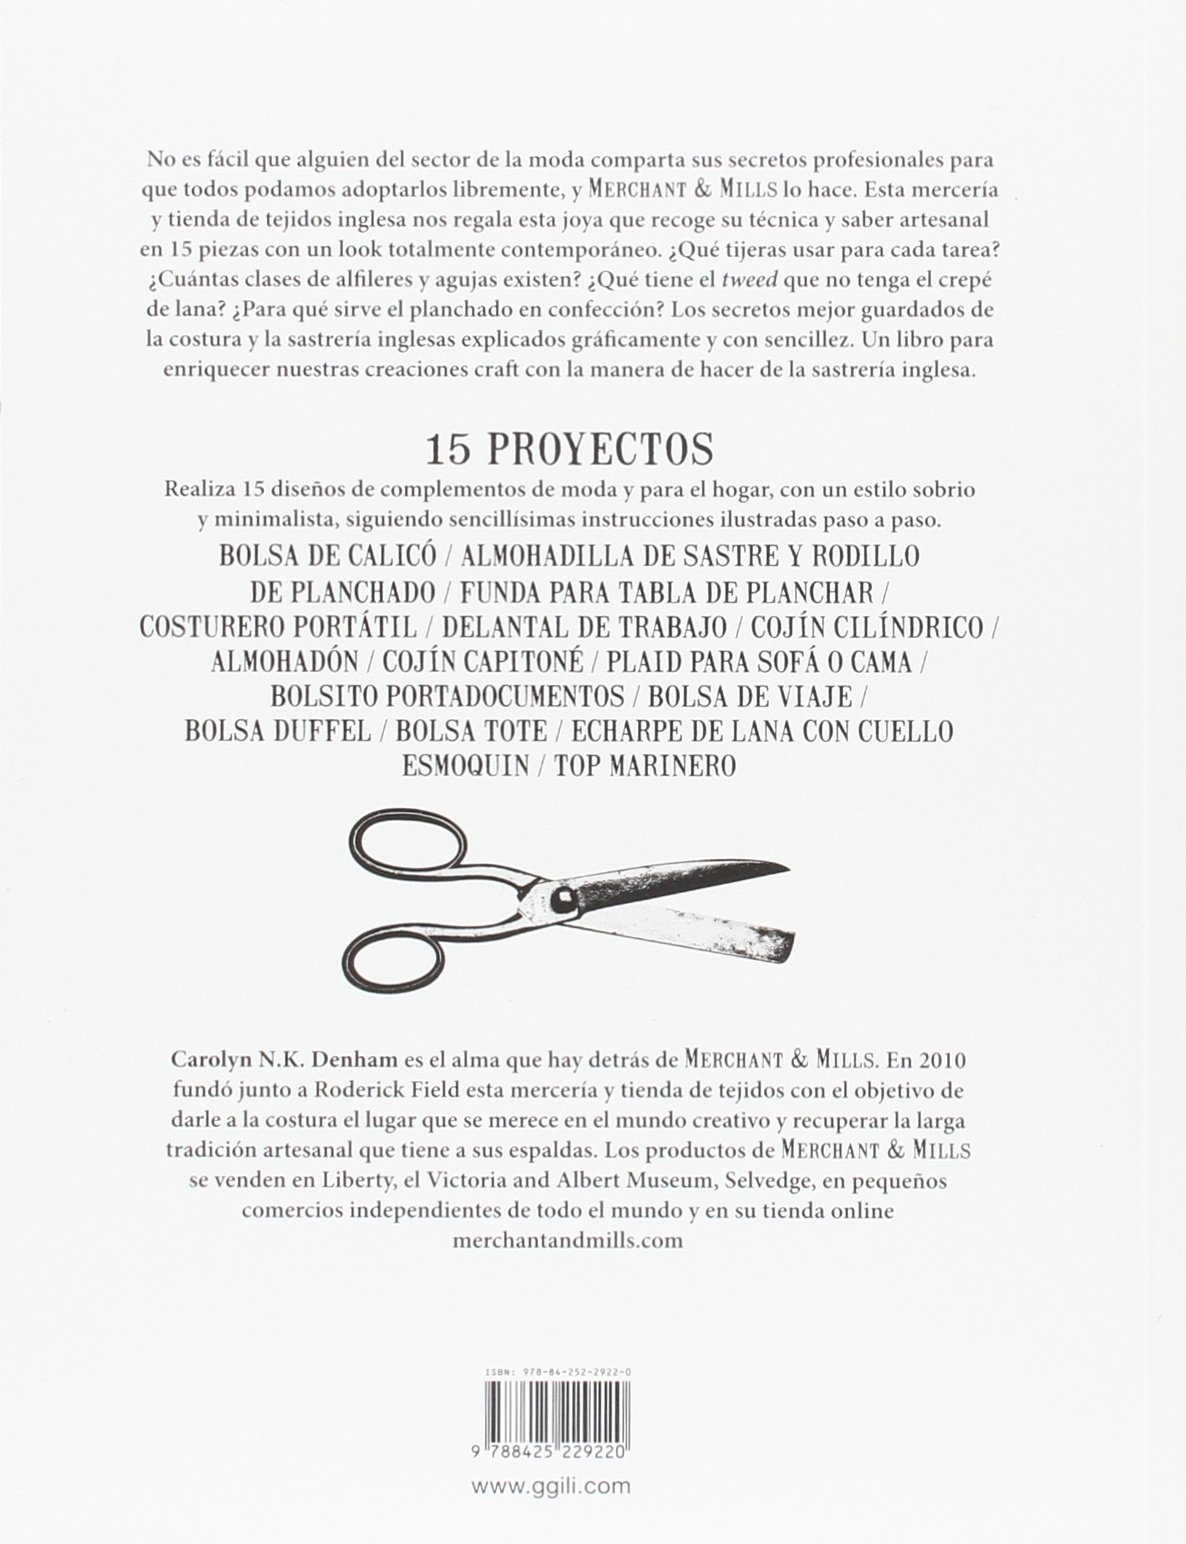 El libro de costura de Merchant & Mills : 15 proyectos ...